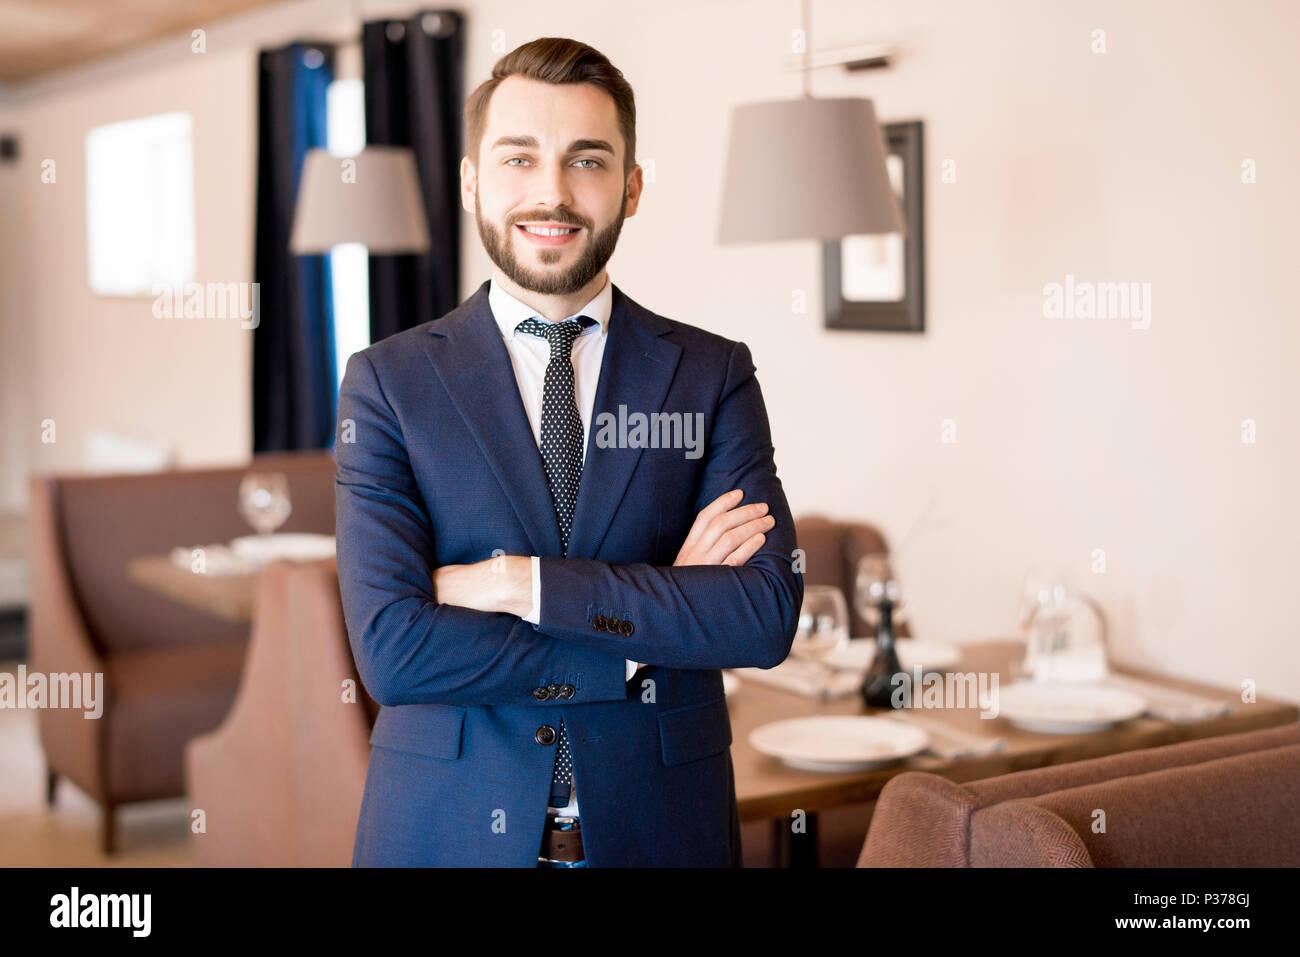 Bearded restaurateur in formal suit - Stock Image